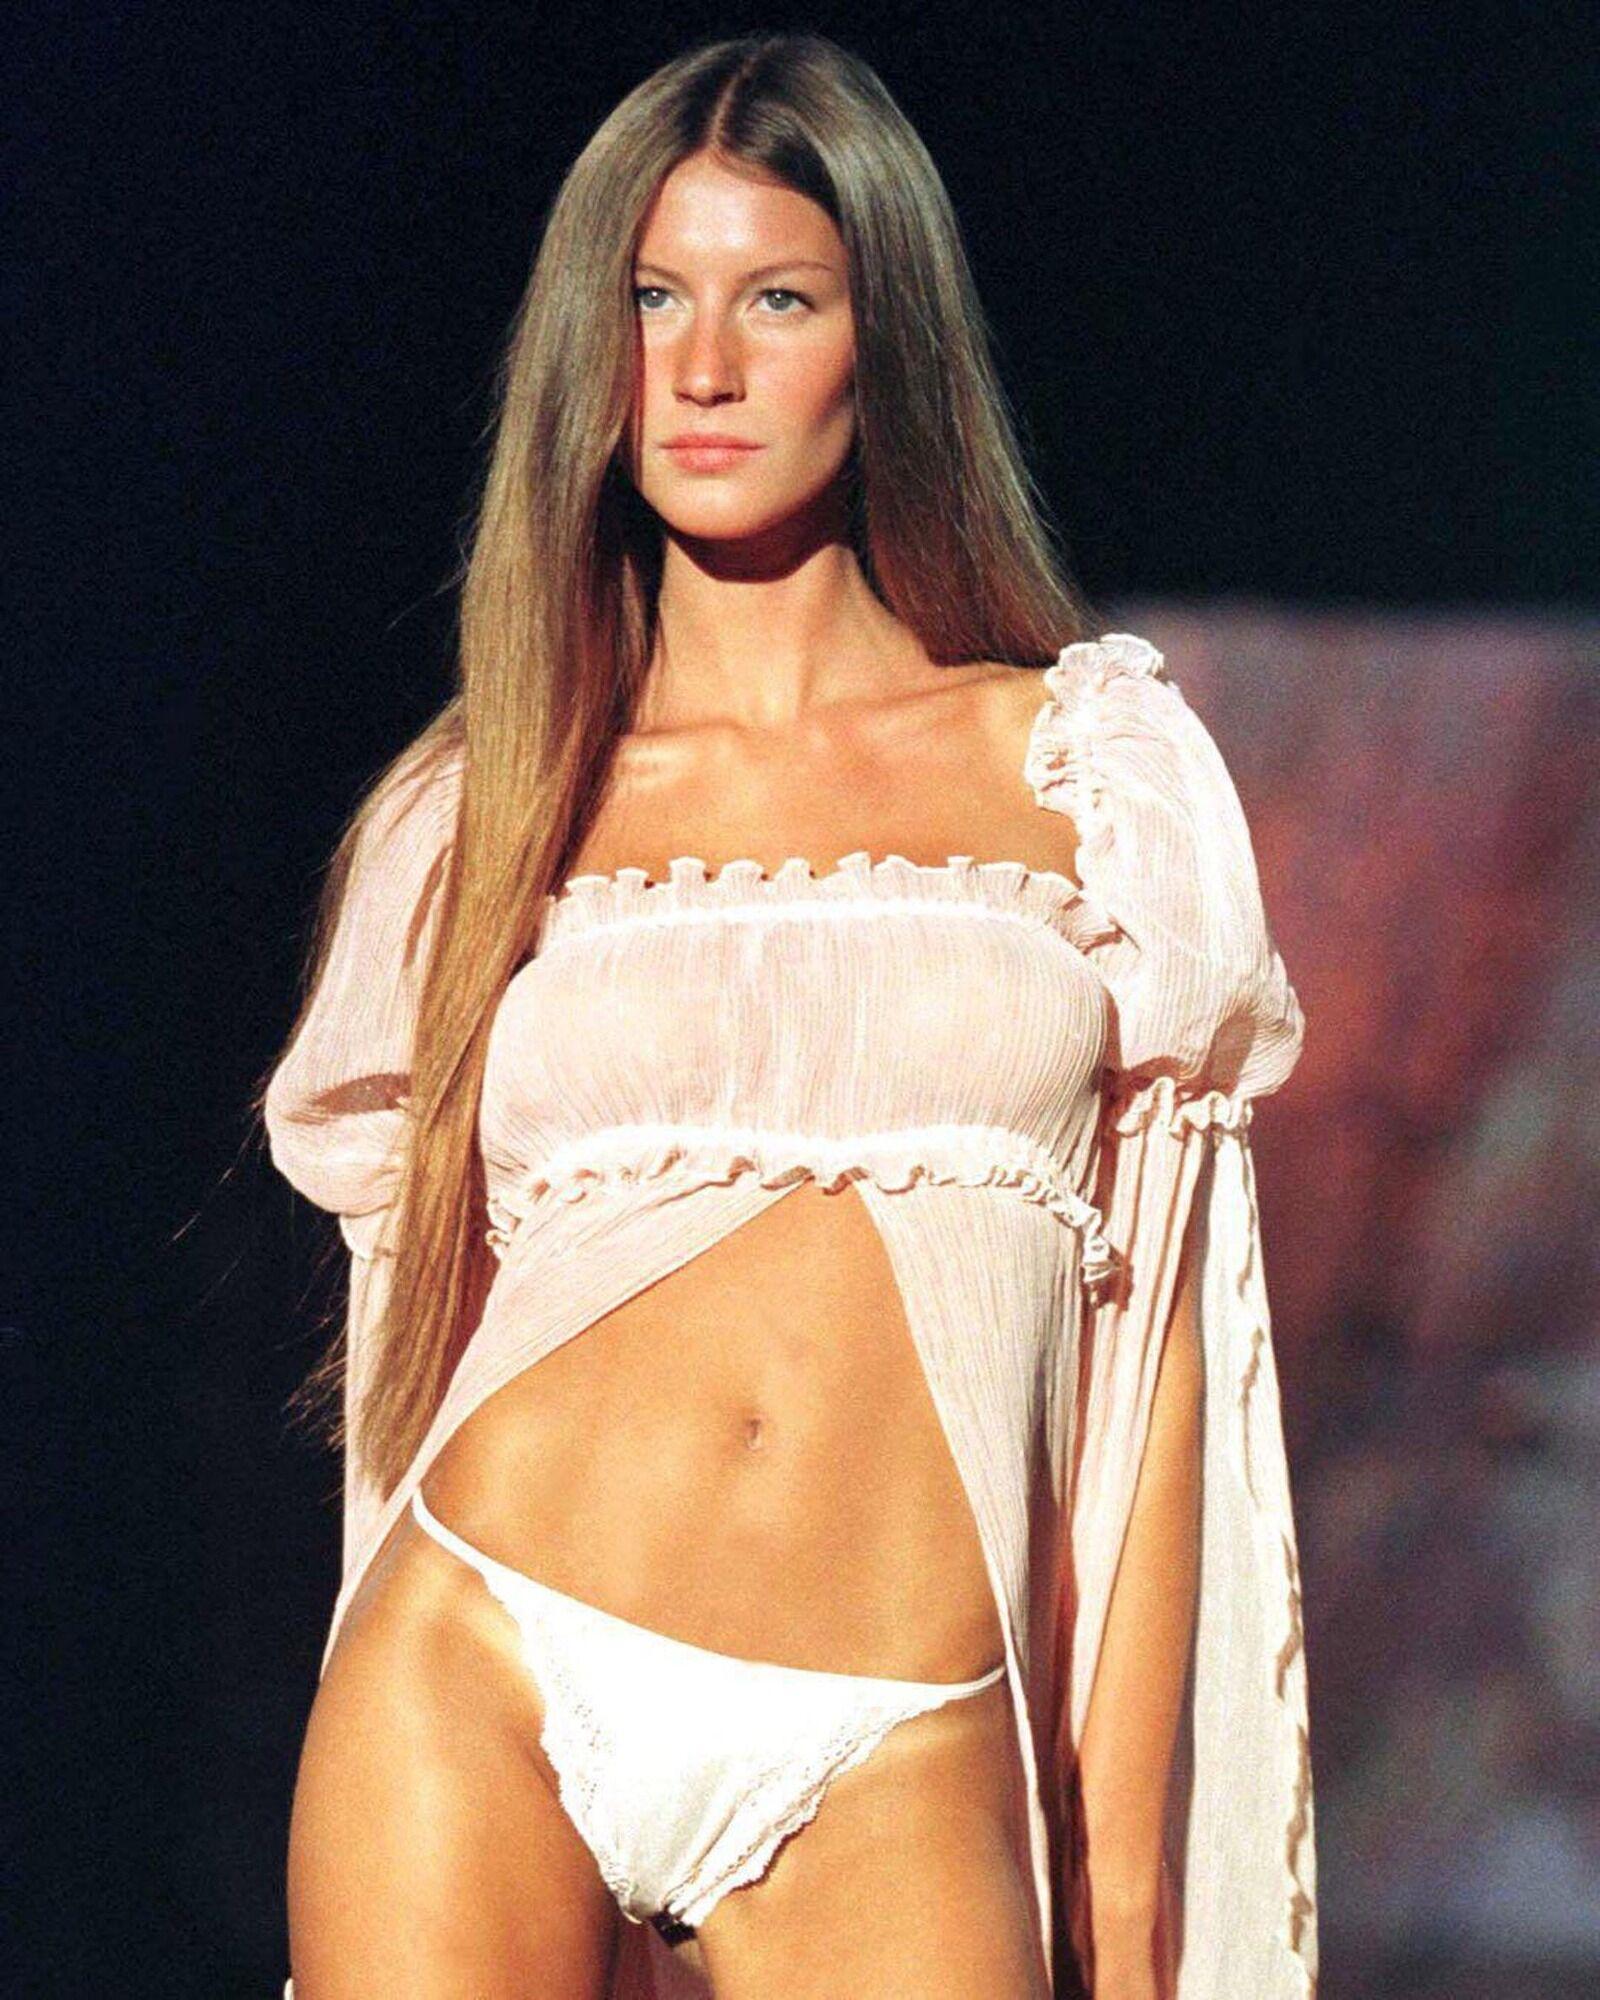 Жизель Бюндхен на показі Victoria's Secret у 1999 році